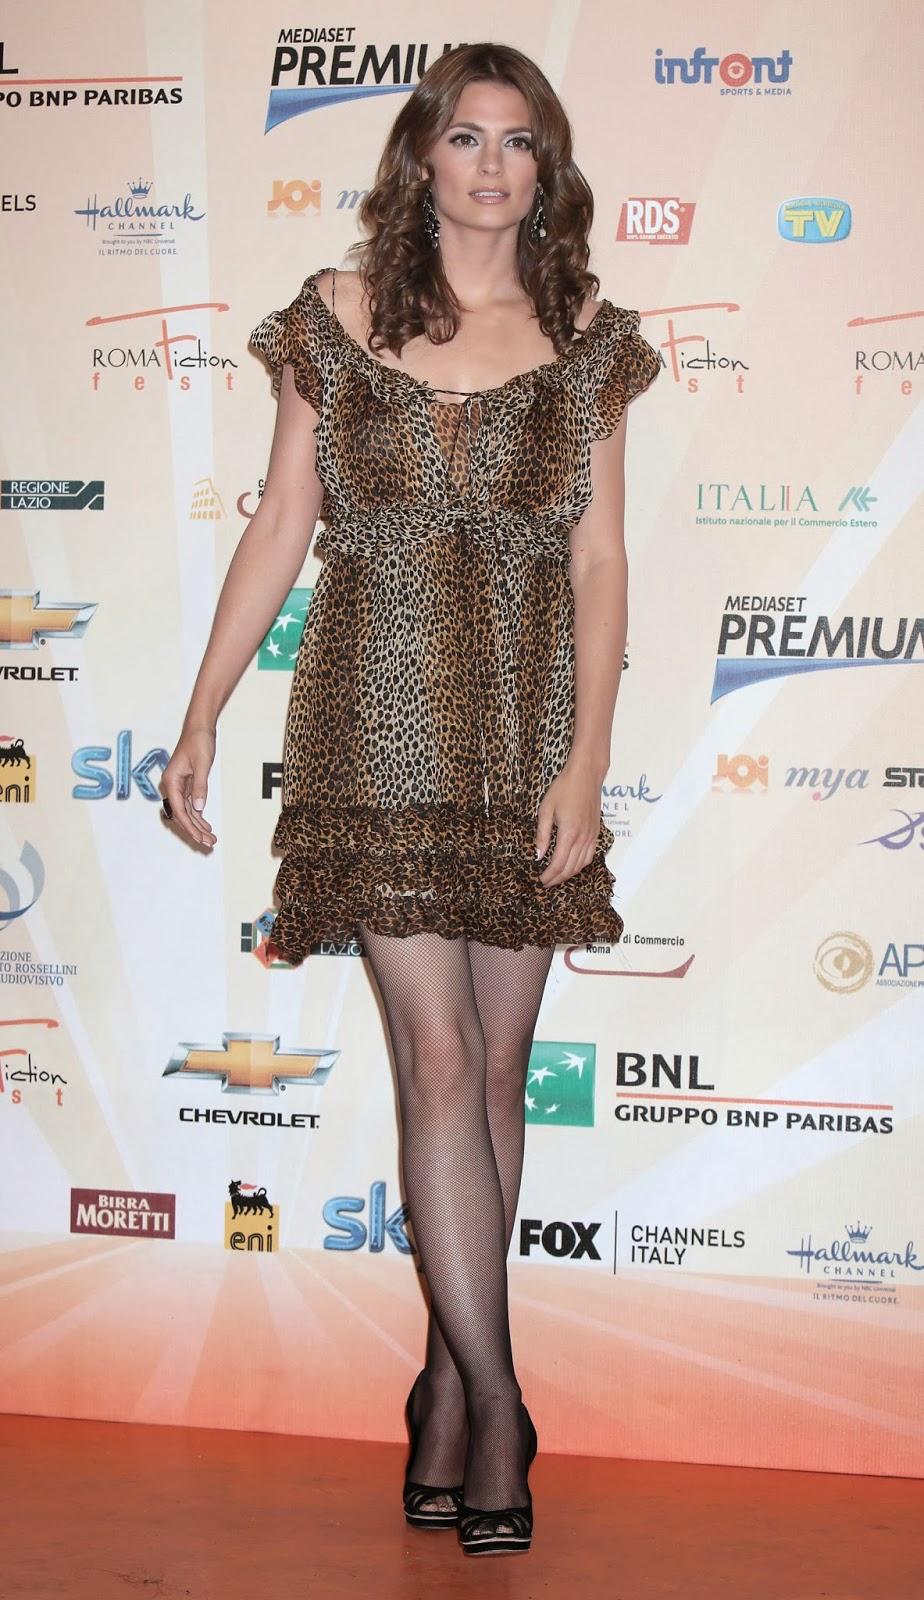 Nylon Celebrities: Stana Katic